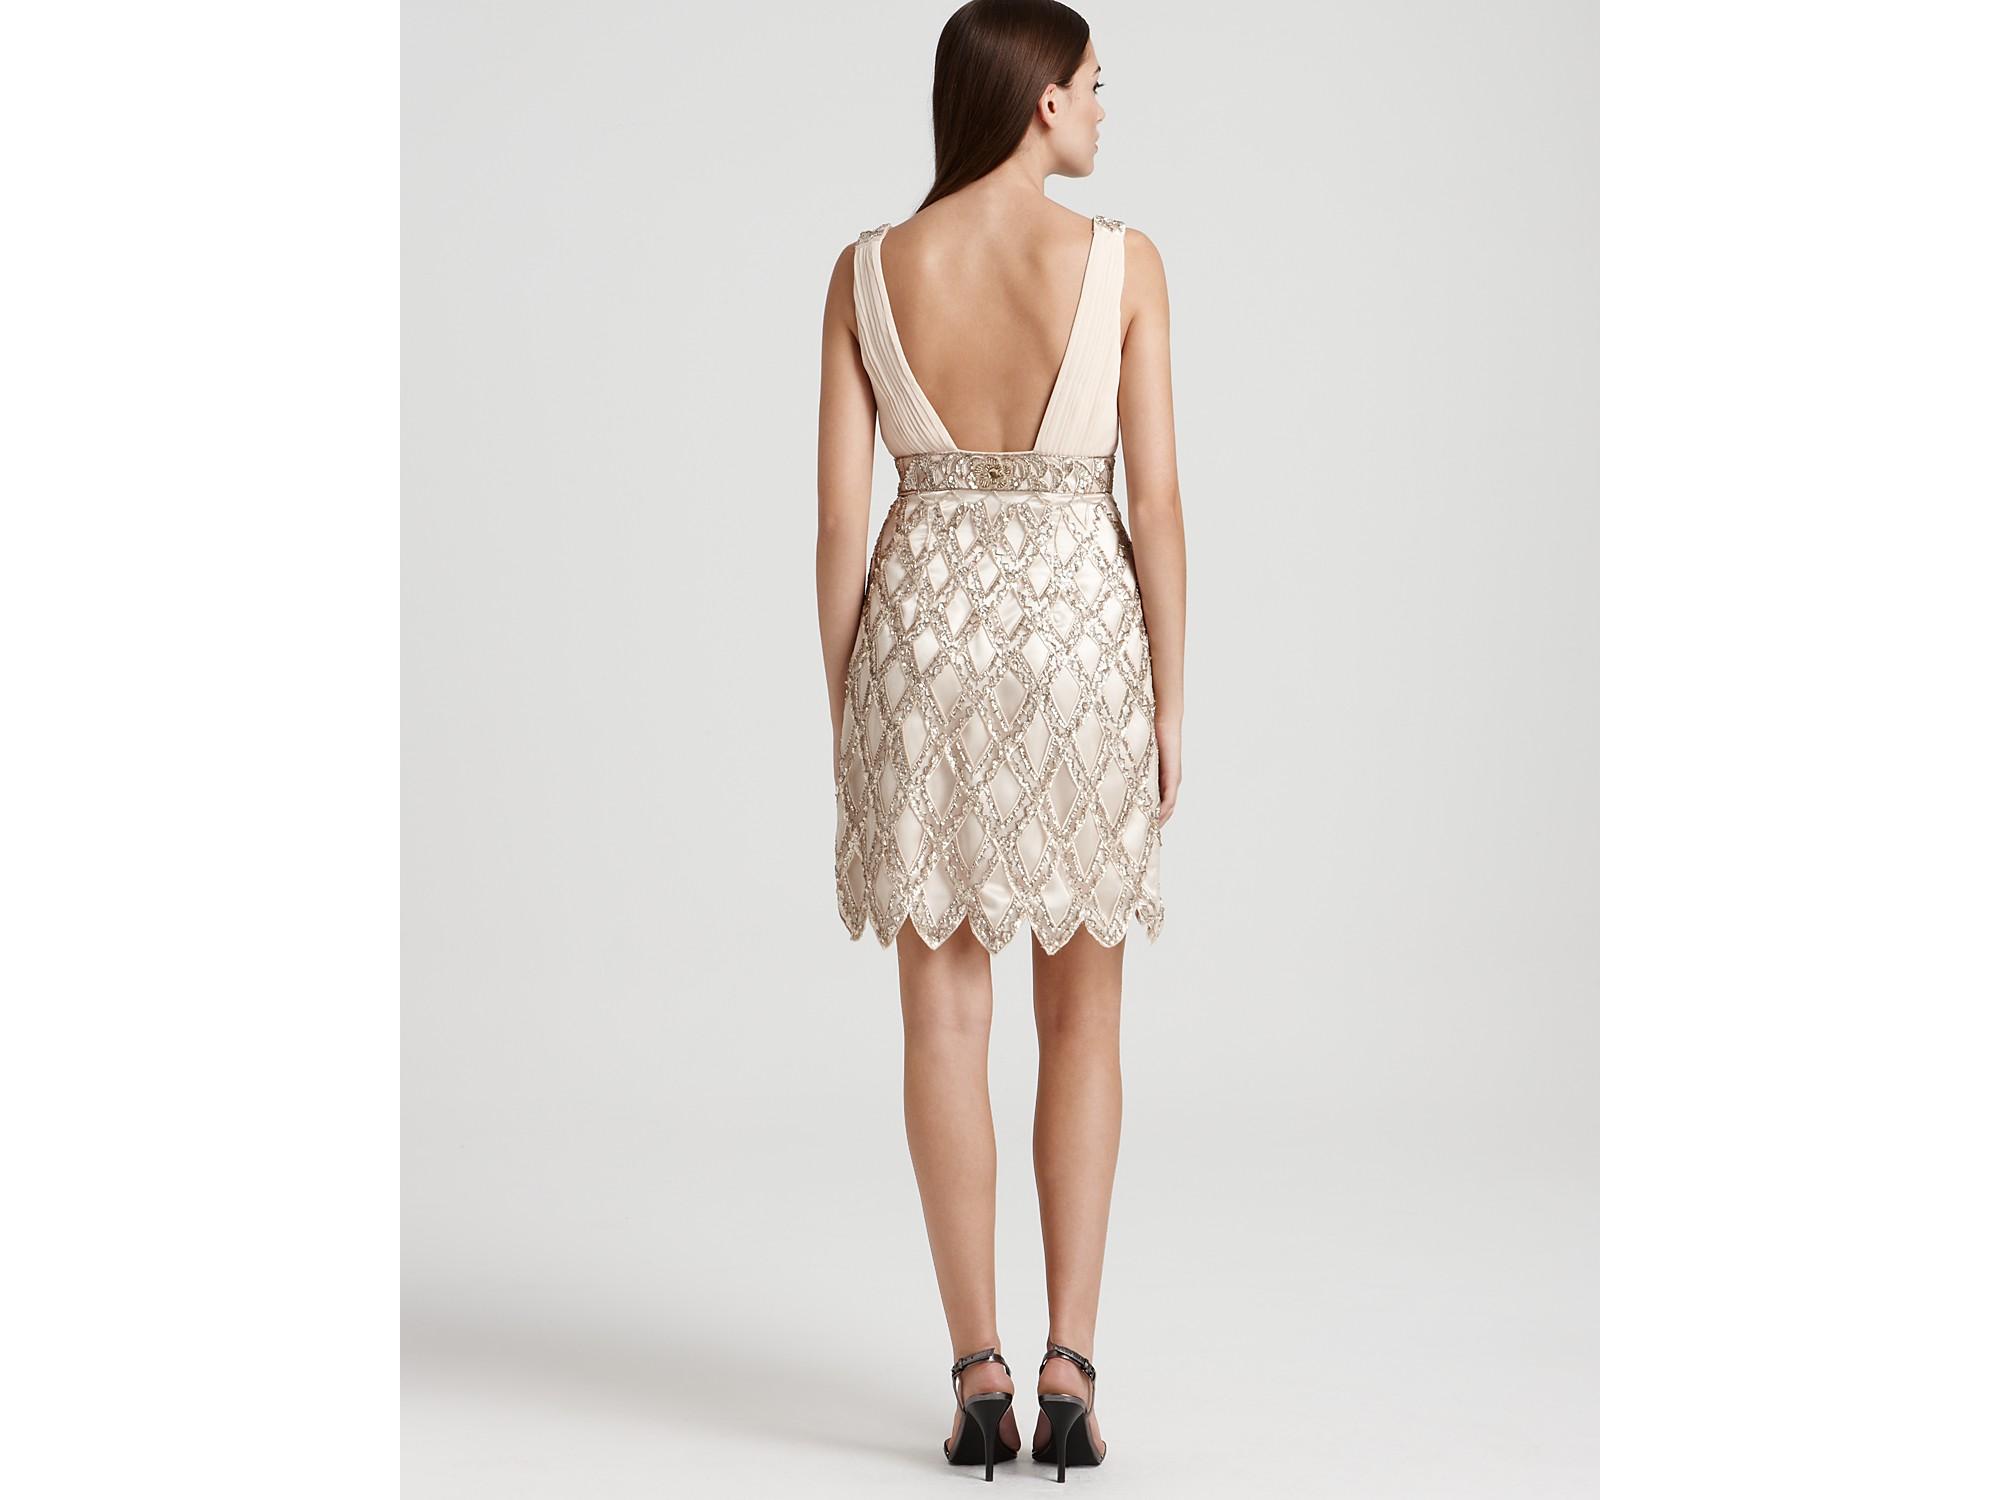 SUE Wong Embellished Flapper Dress Size 14 | eBay